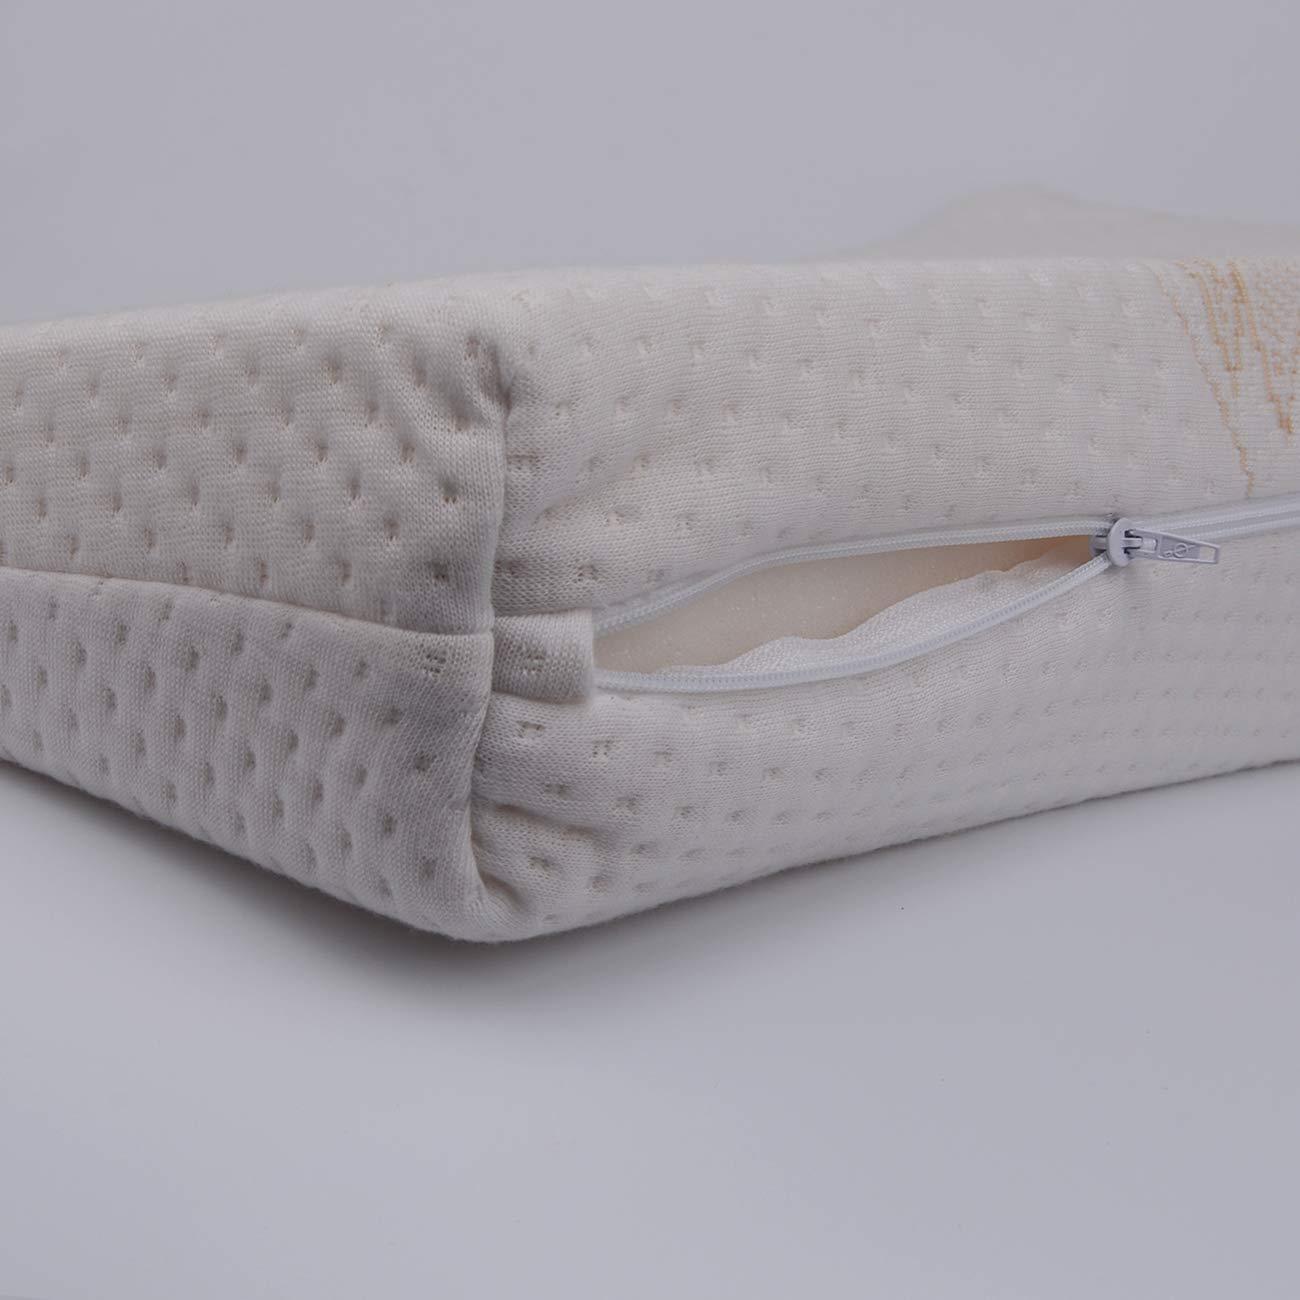 Pekies Keilkissen f/ür Babys 15/° Inclinaci/ón beige gegen Verluste hergestellt in Spanien 40 cm Ancho